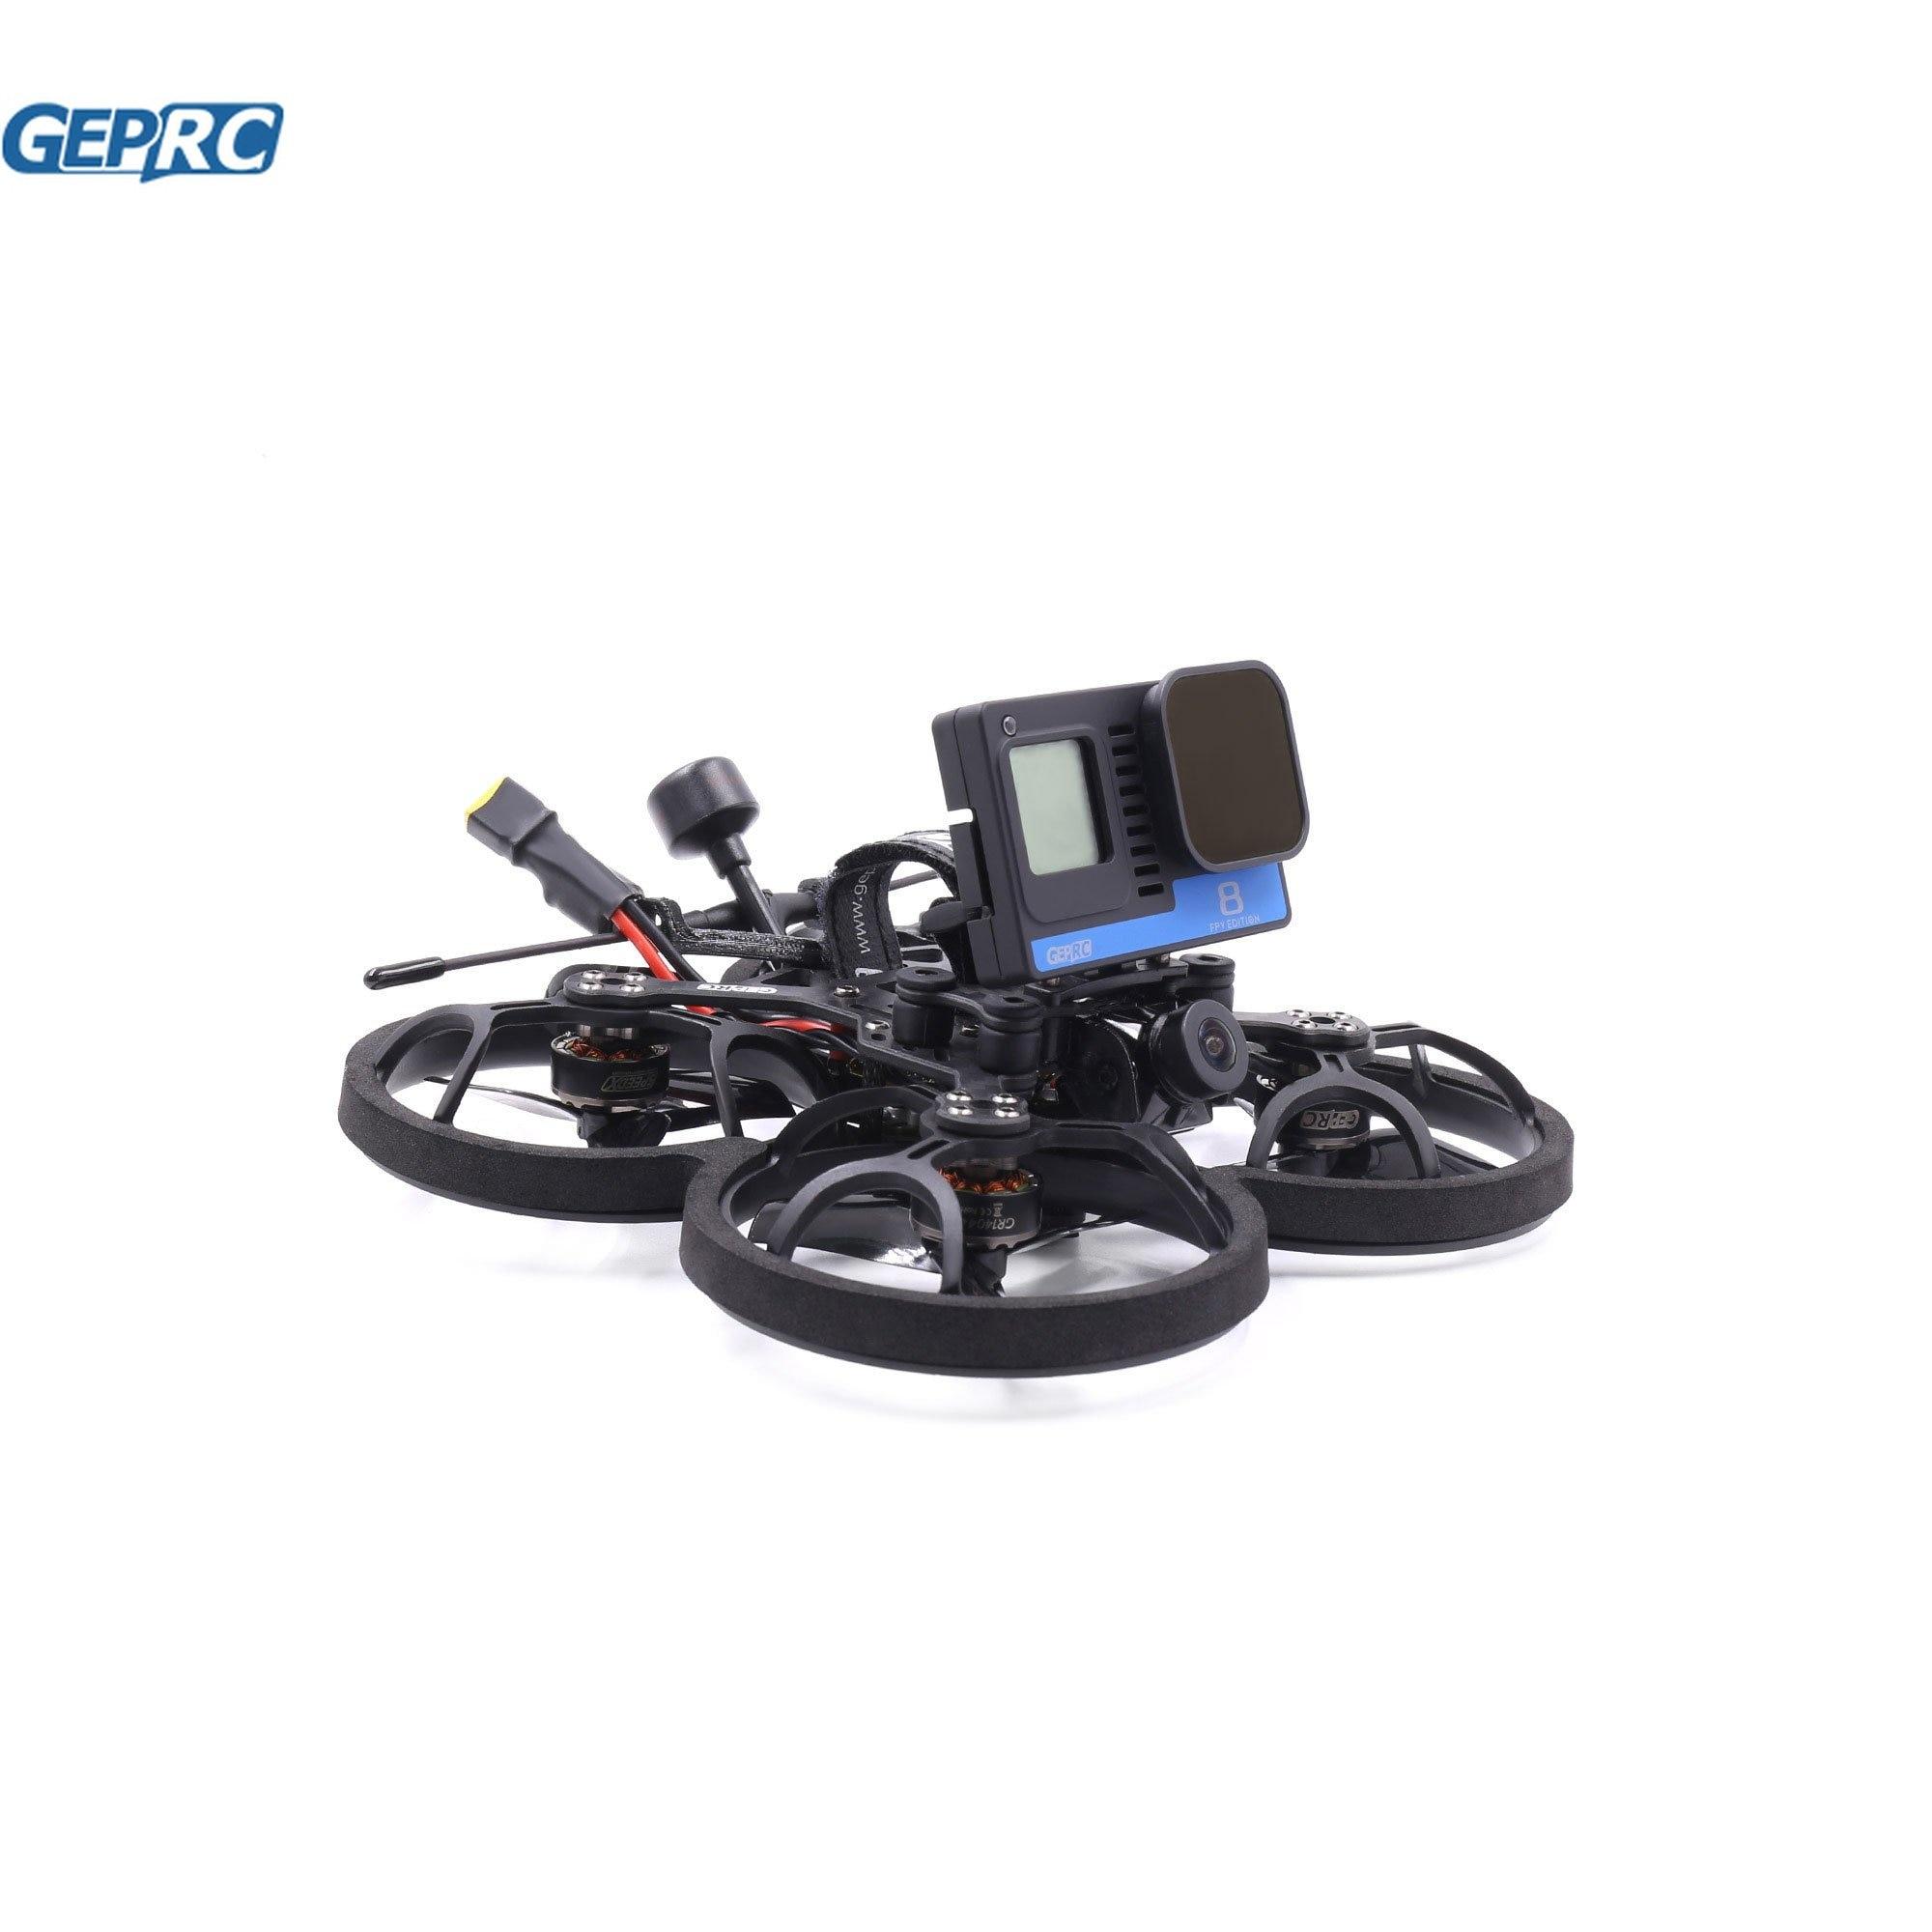 GEPRC-Dron con cámara Polar, teledirigido cuadricóptero, con nebulosa Nano/nebulosa Pro/nebulosa Polar, 25 HD